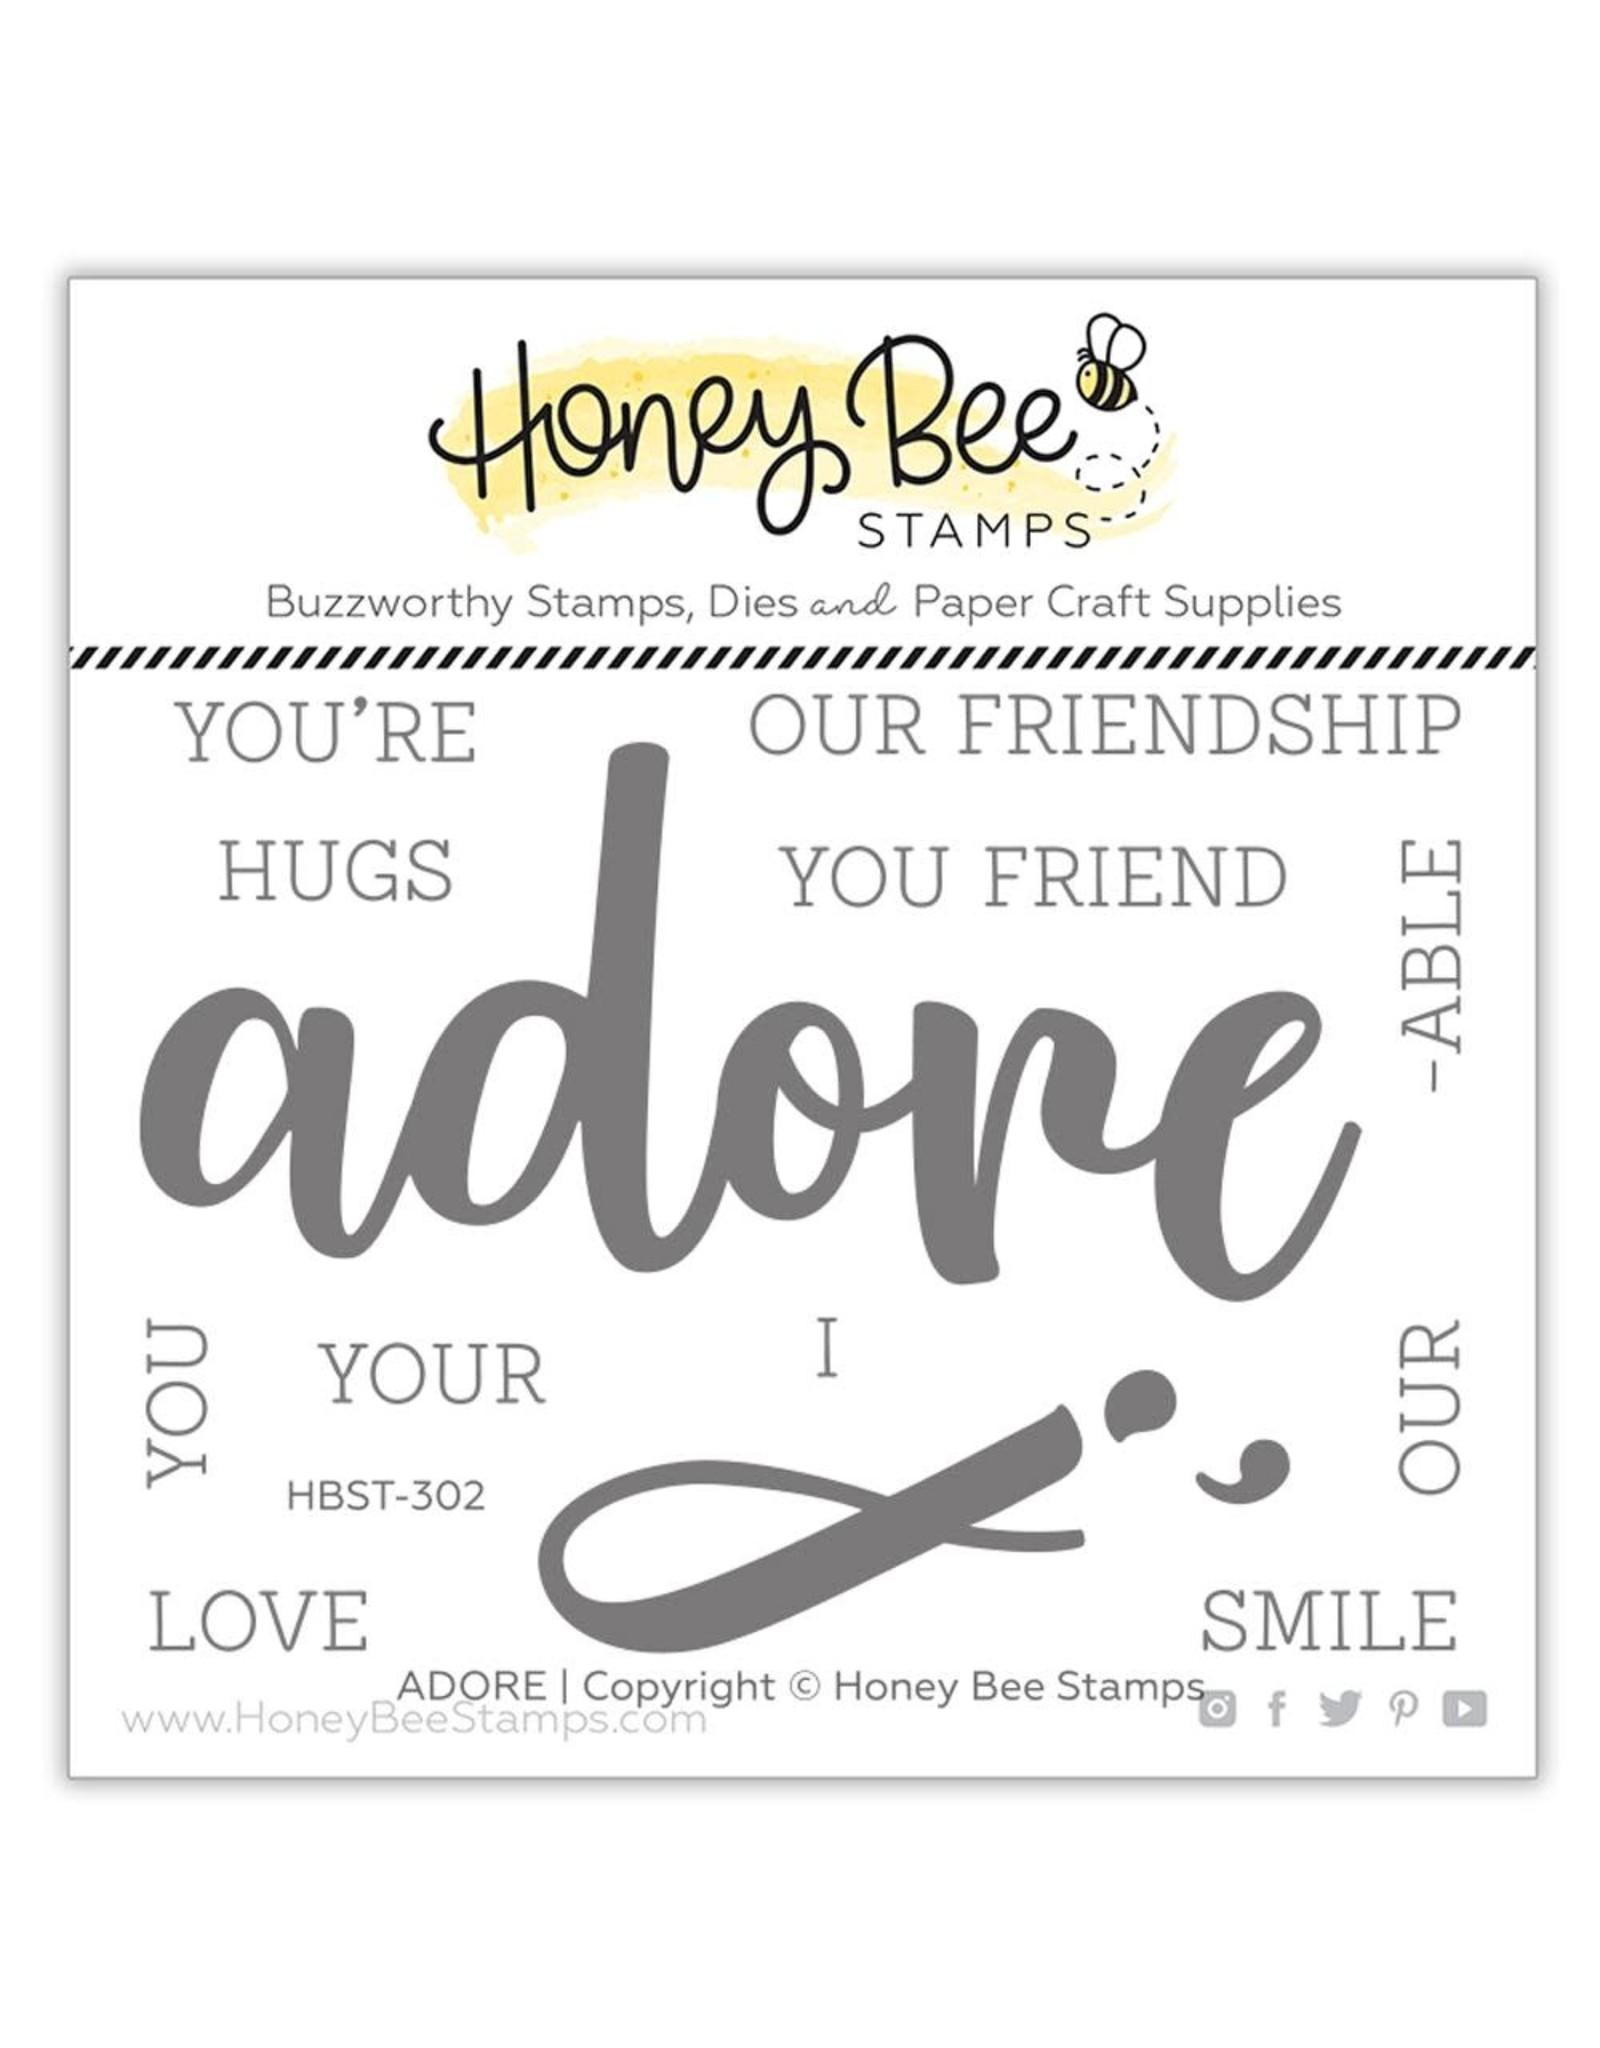 Honey Bee Adore Stamp